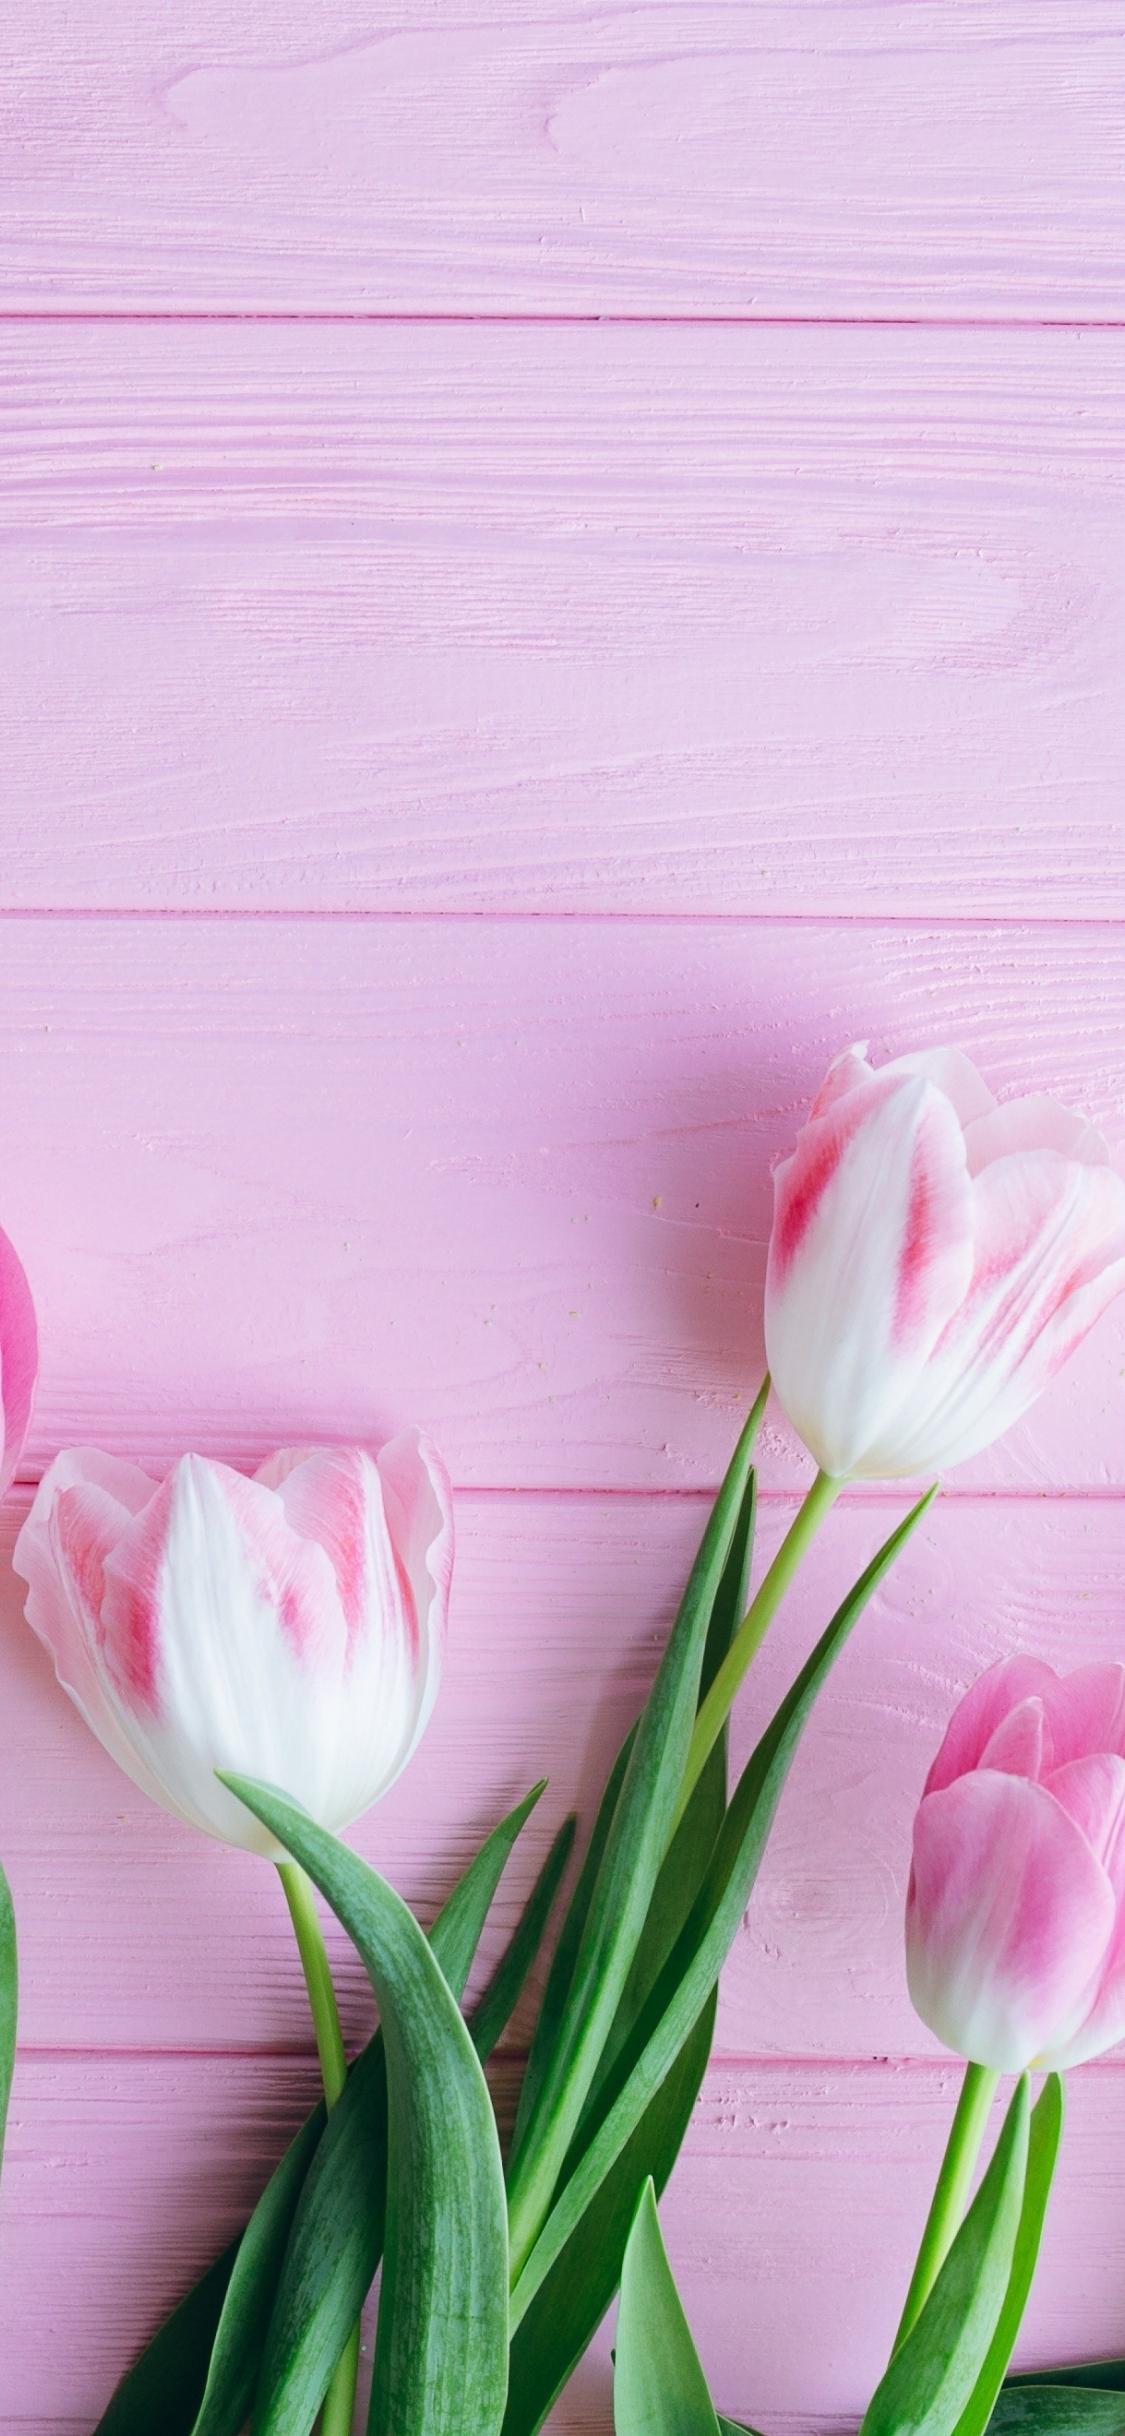 Download 1125x2436 Wallpaper Tulip Flowers Fresh Iphone X